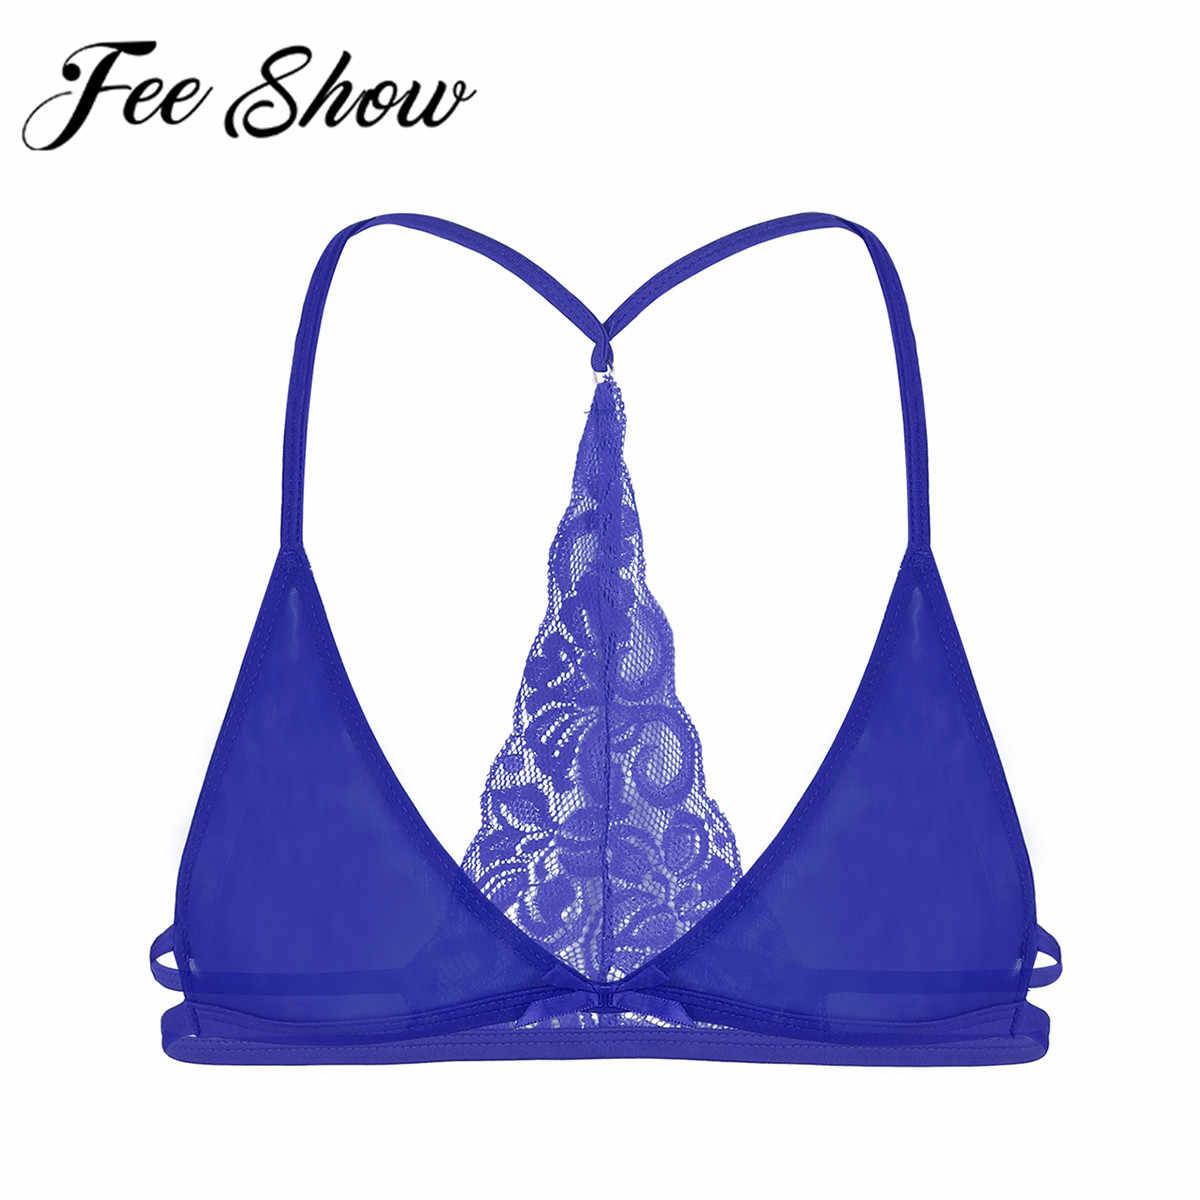 FEESHOW Mens See Through Sheer Lace Sissy Girly Bikini Bra Panties Set Underwear